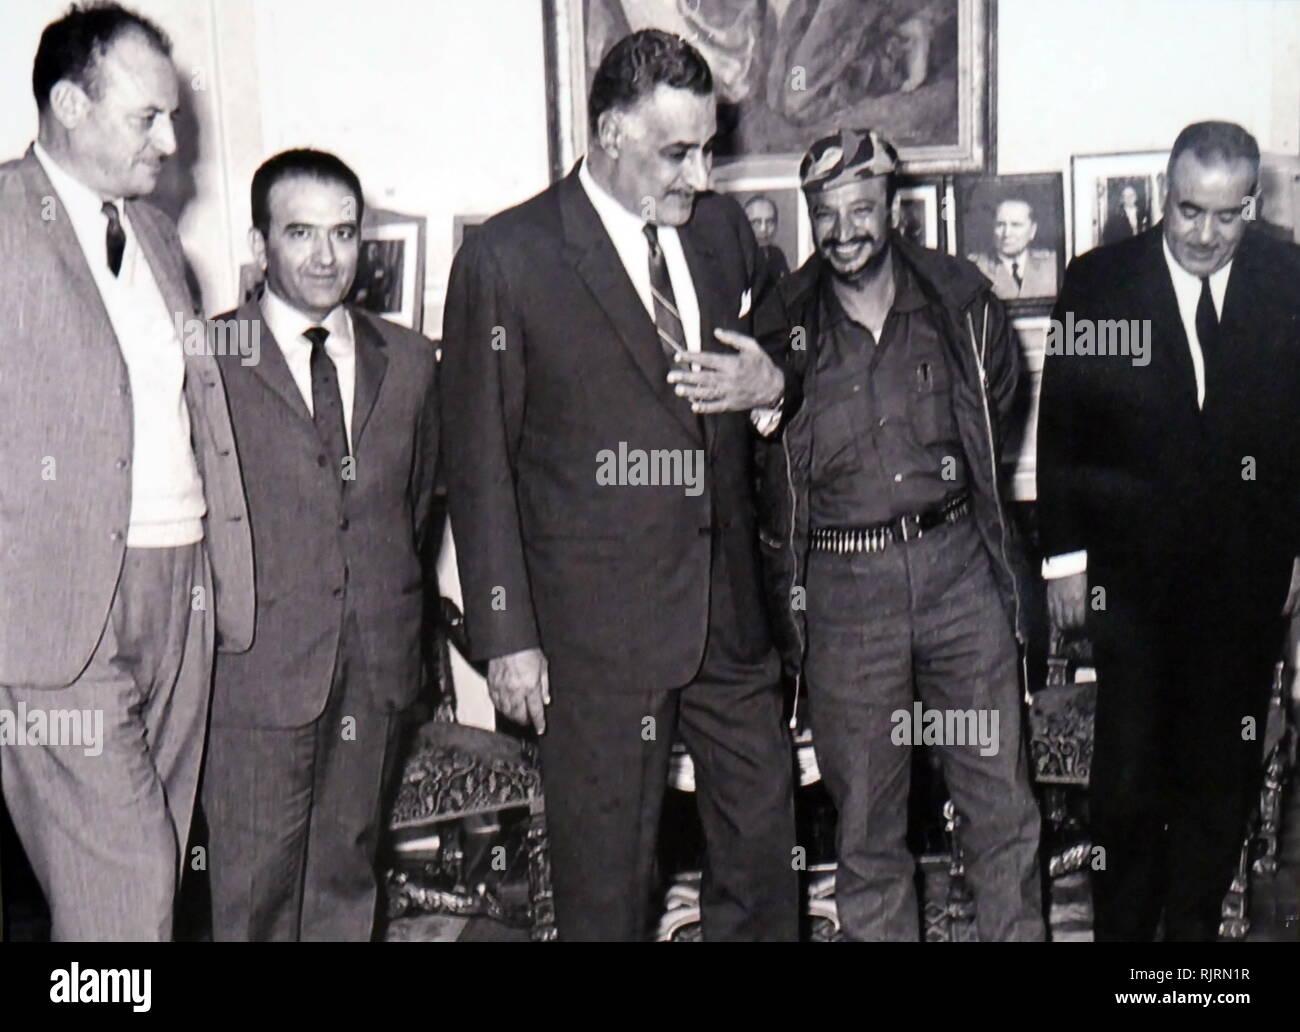 President Gamal Nasser of Egypt with Palestinian leader, Yasser Arafat 1968 - Stock Image